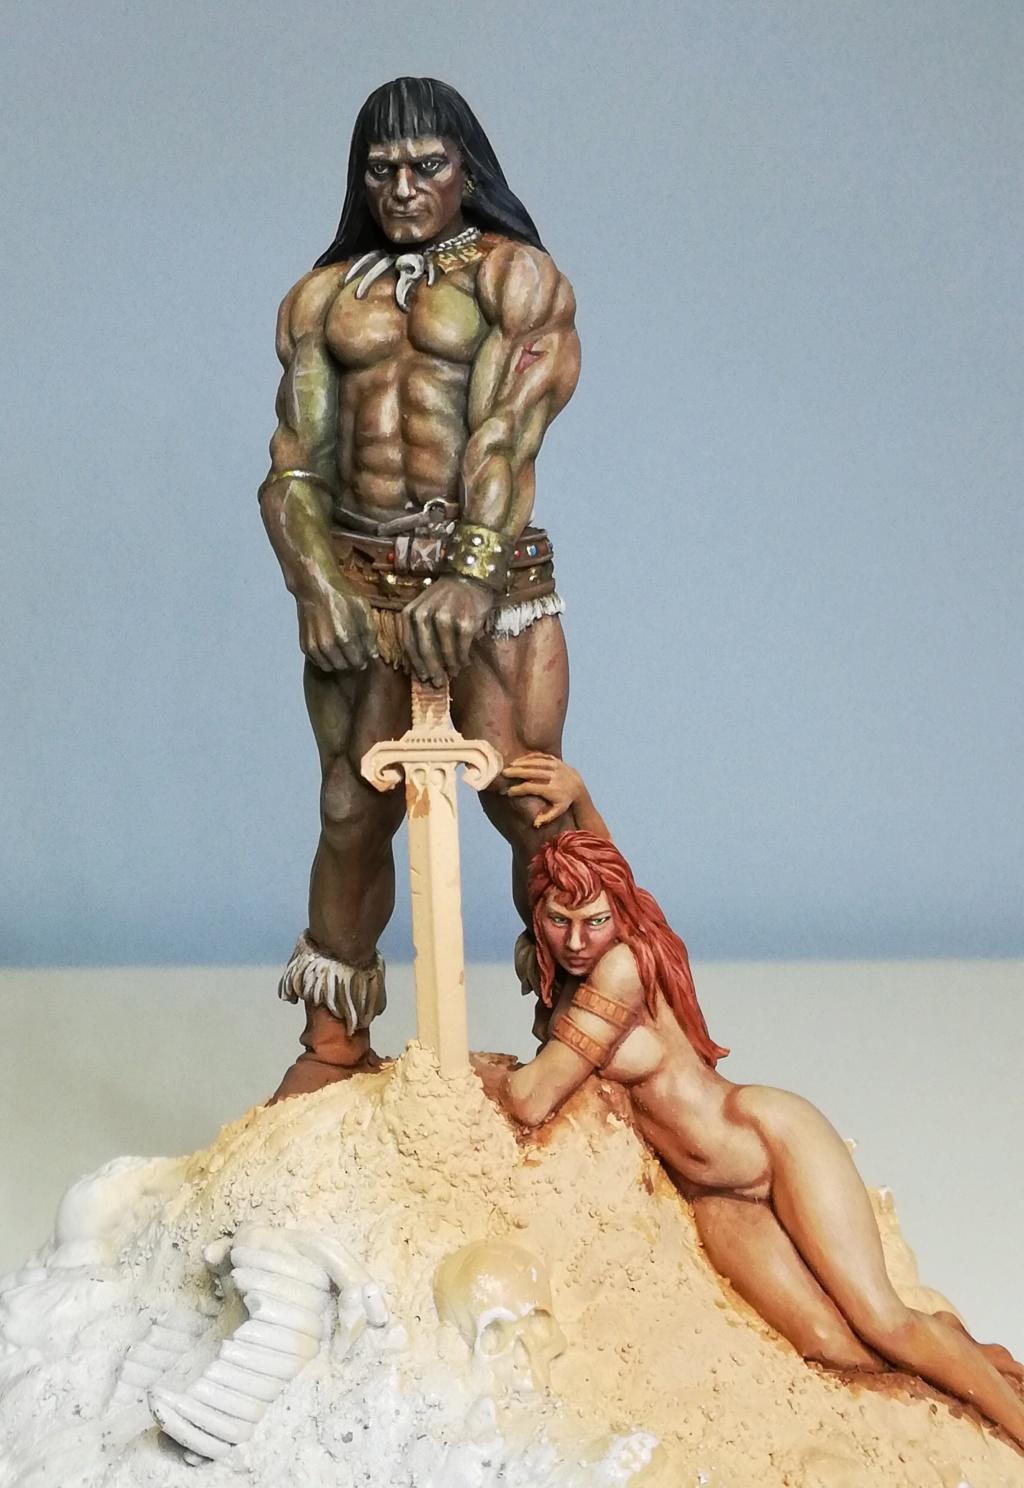 Conan, d'après Frazetta - Terminé Conan_32